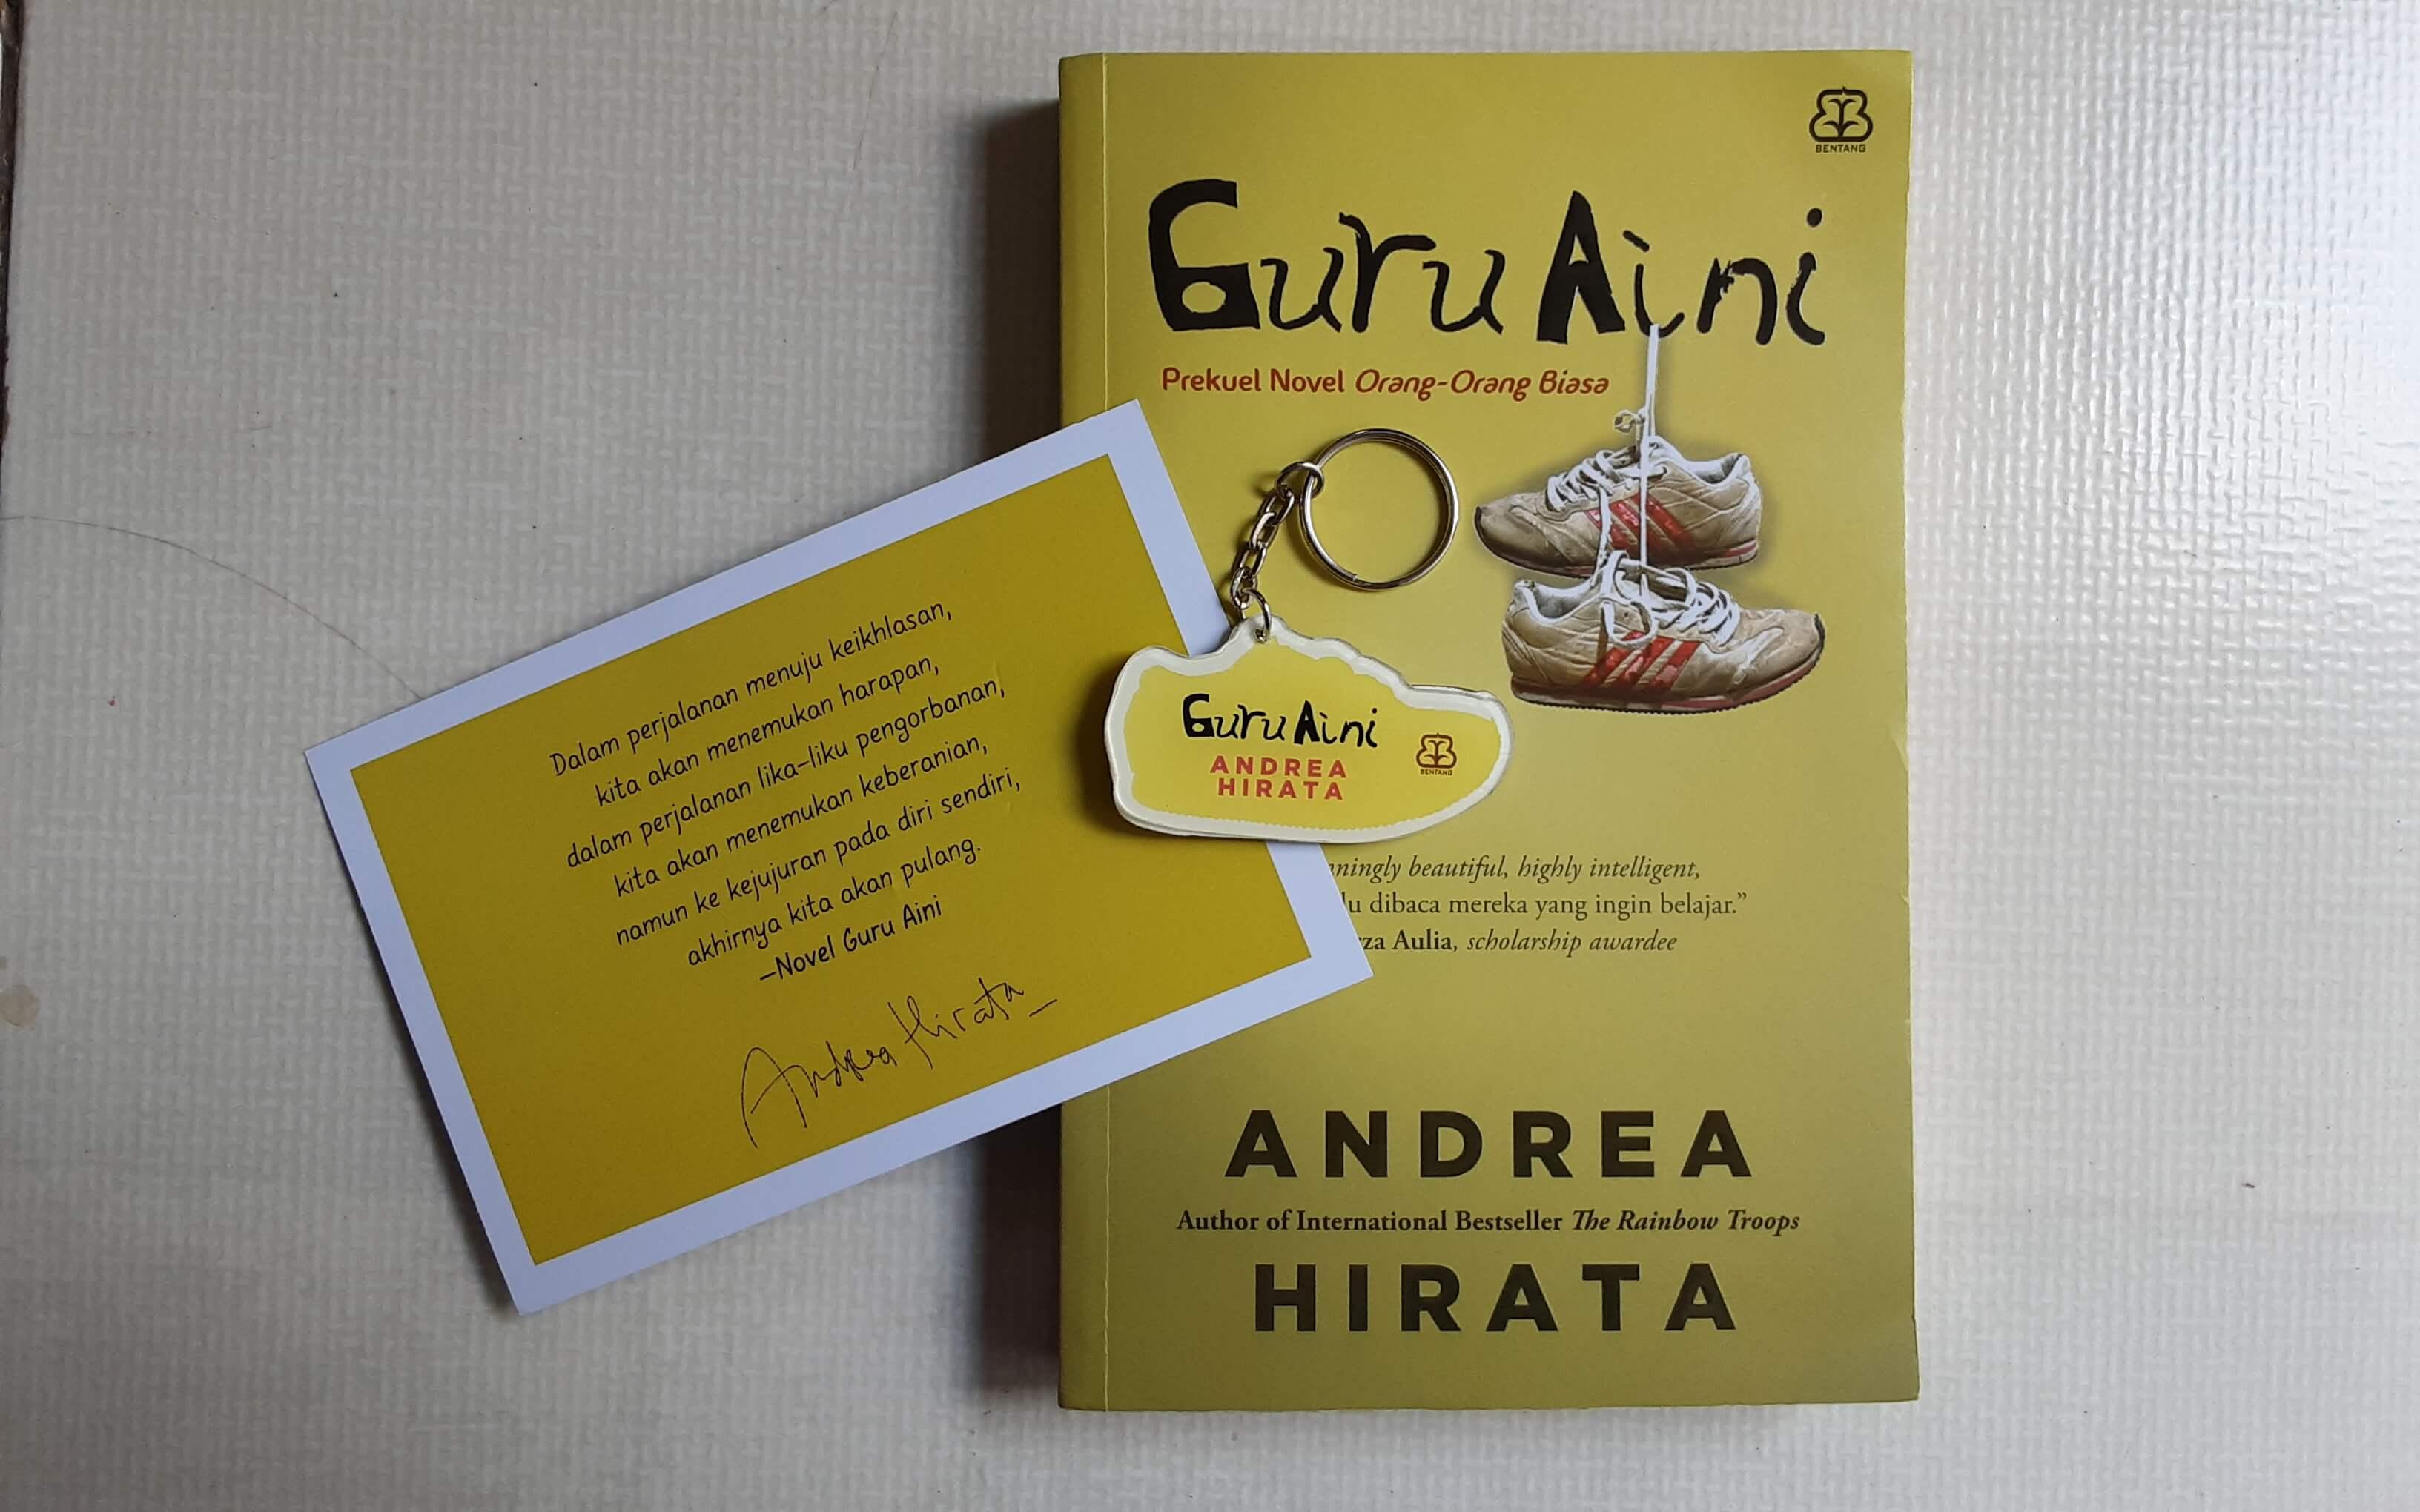 Buku Guru Aini: Matematika Dilematis dari Andrea Hirata